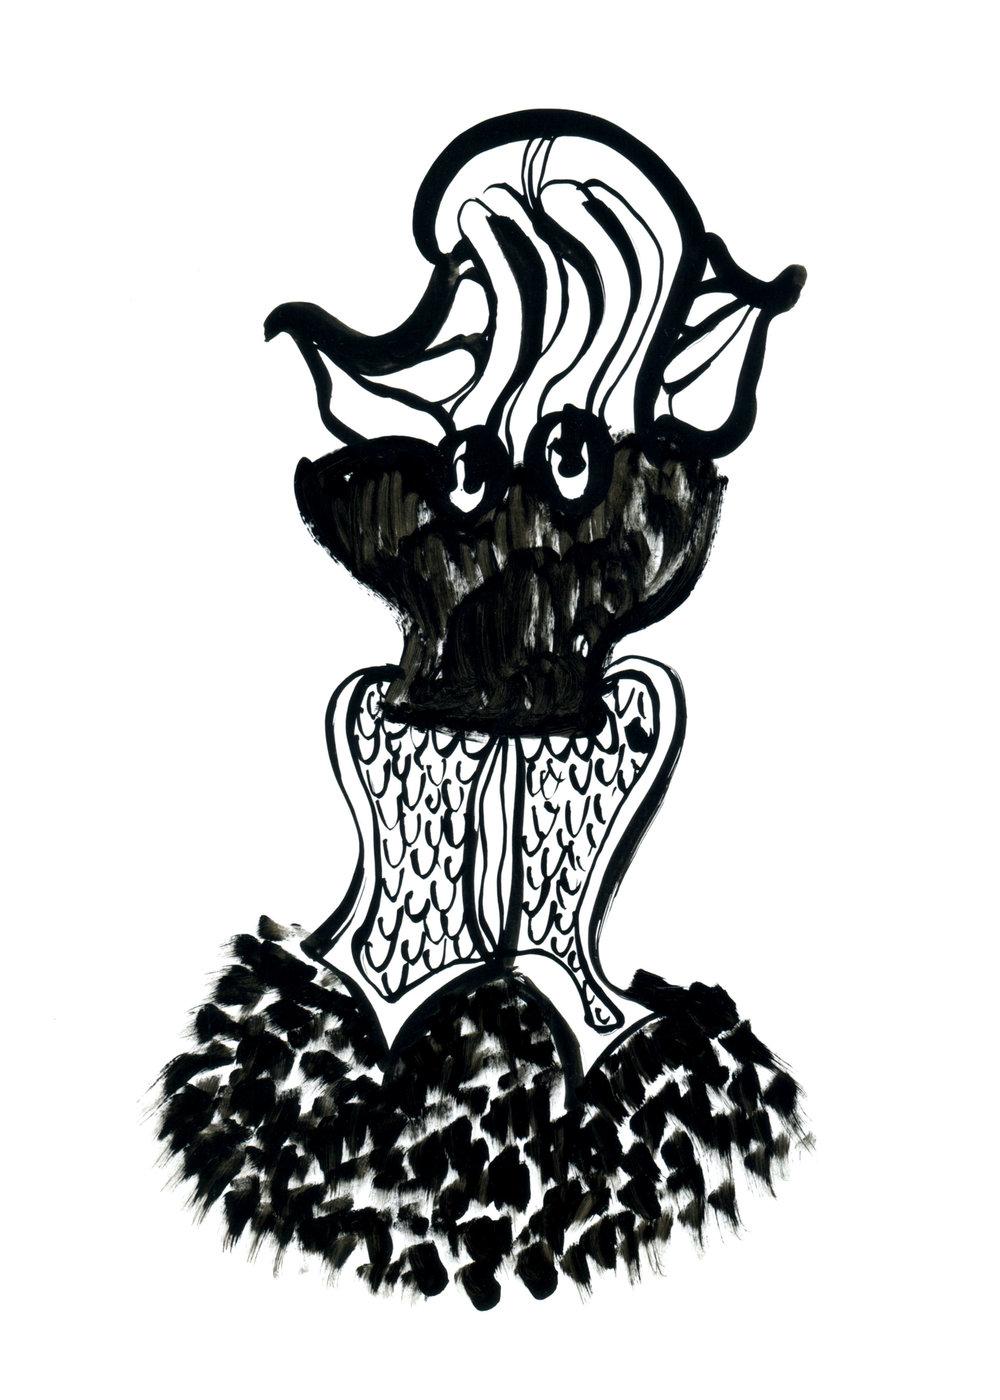 Drawing-Abstract-Ink.jpg